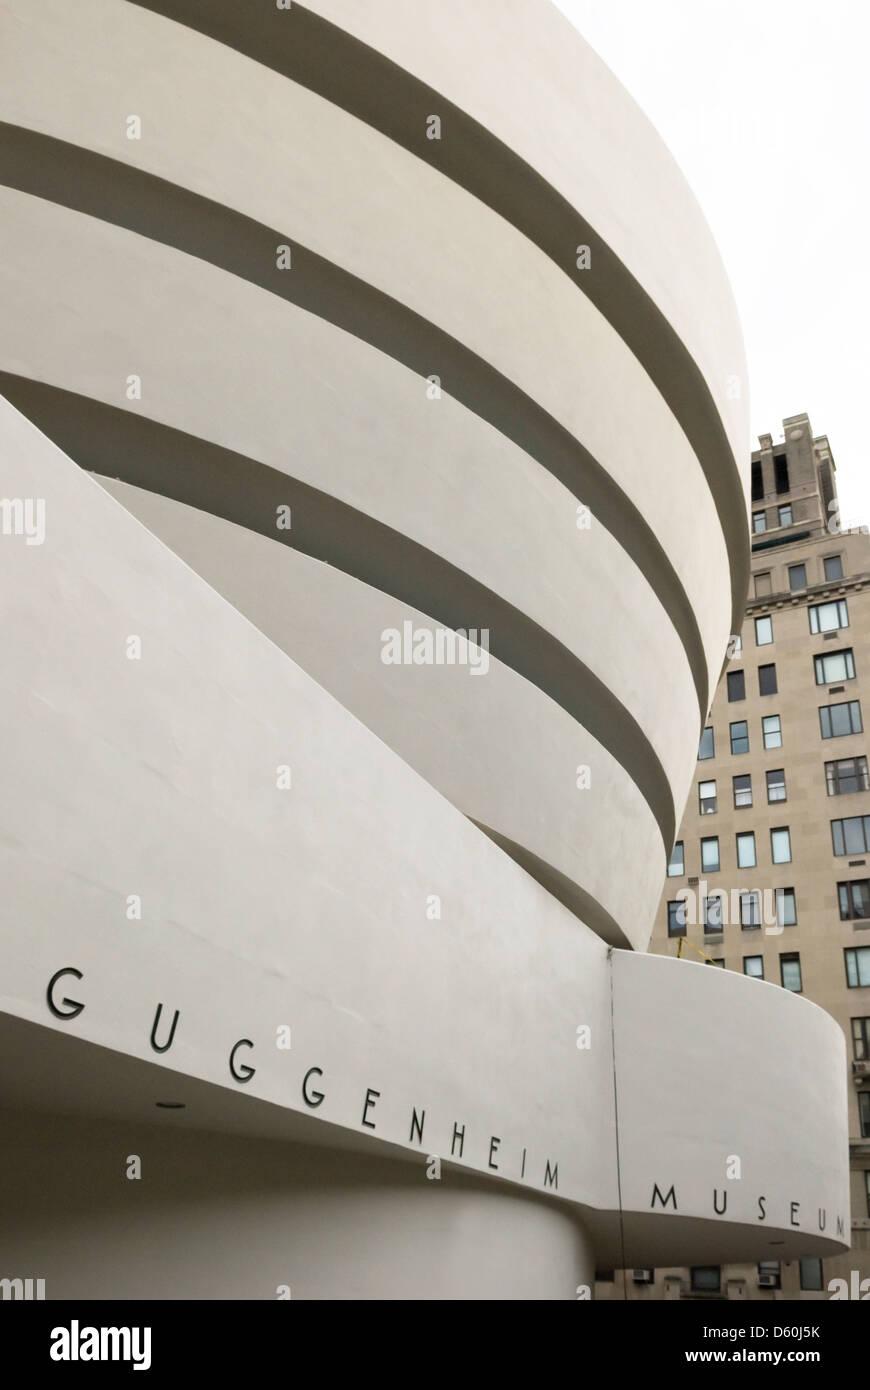 Photo Of The Guggenheim Stock Photos   Photo Of The Guggenheim Stock ... e27ac77952b2